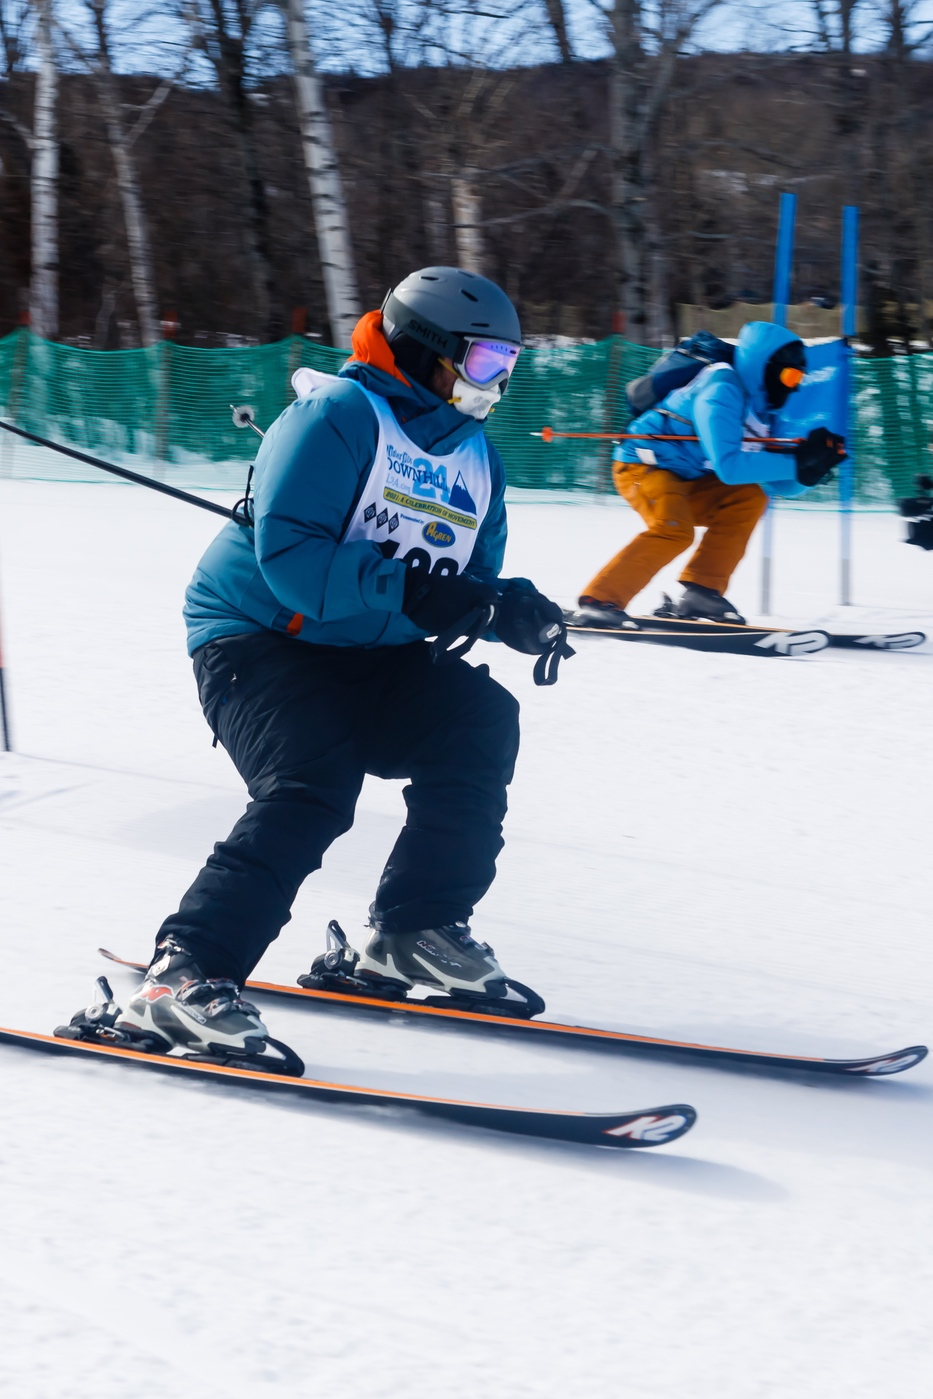 WinterKids Downhill 24 2021 SDP 3440